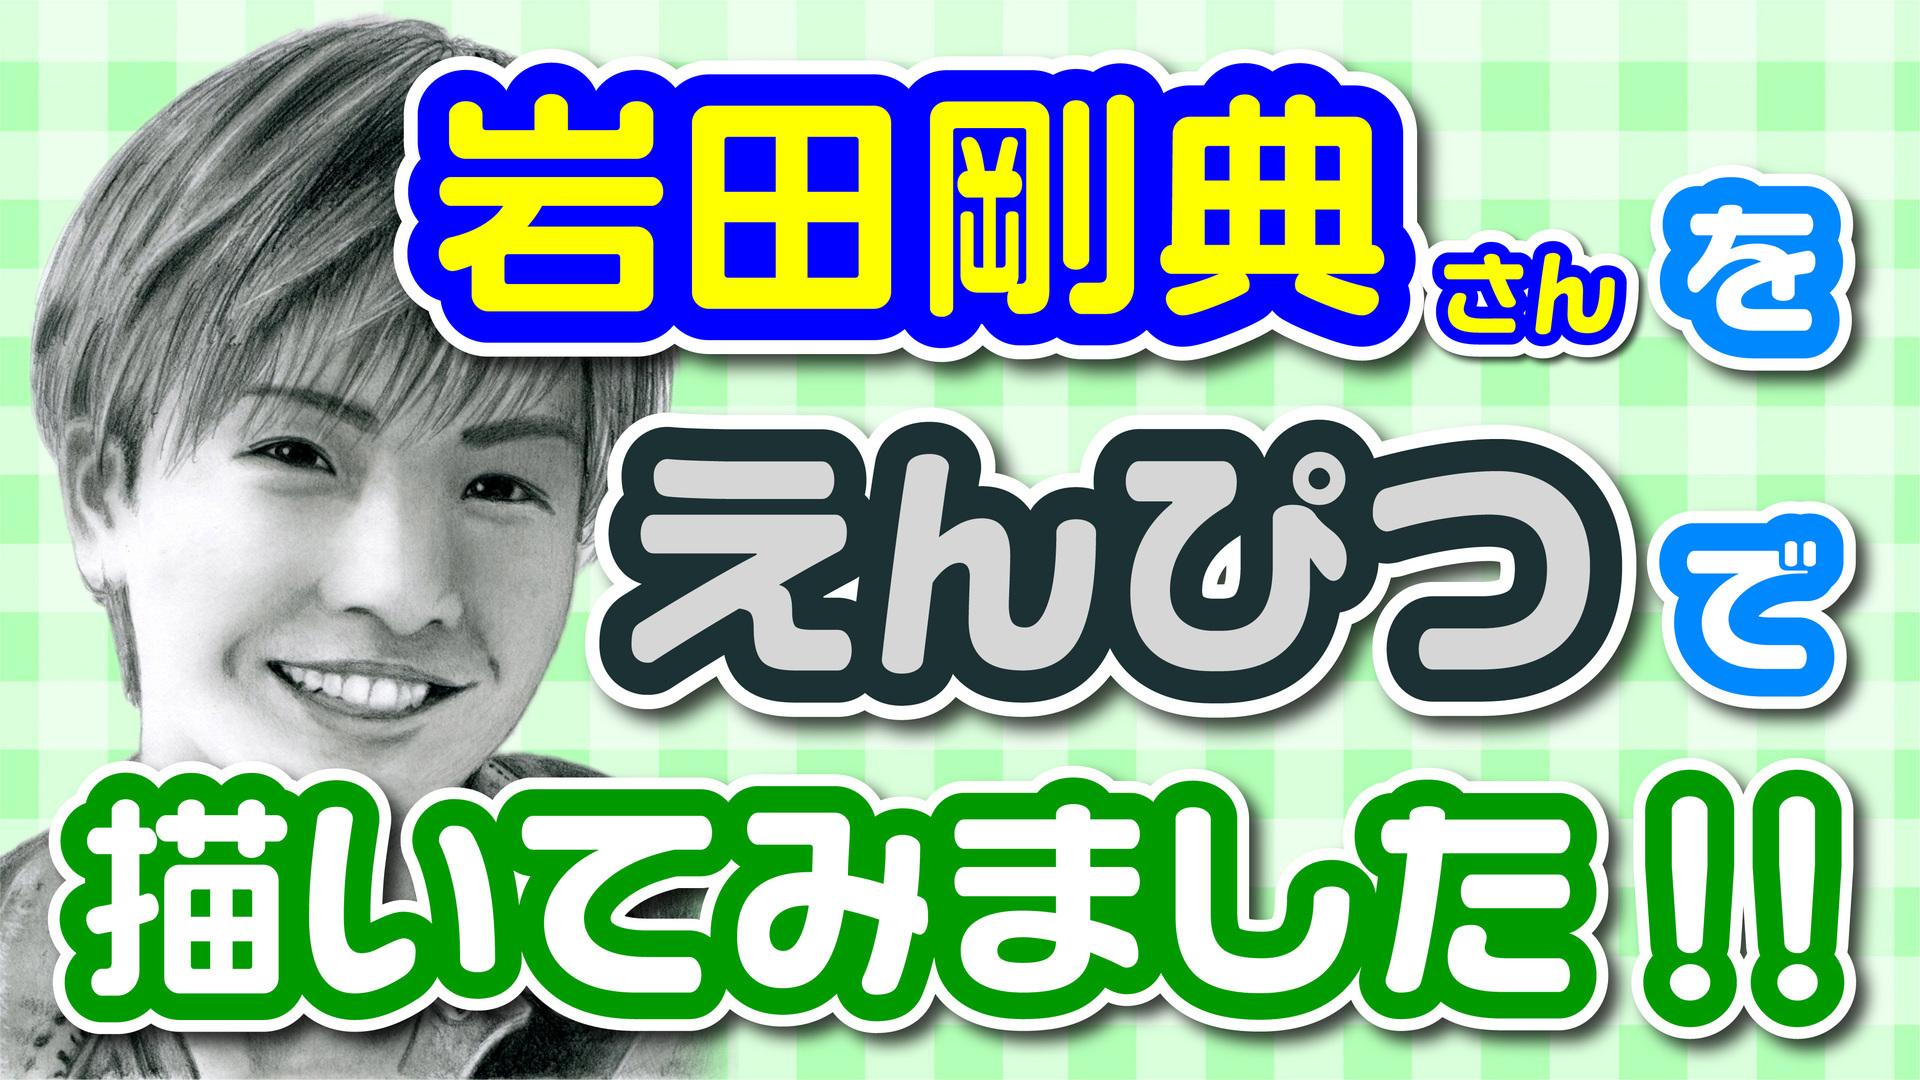 Youtubeサムネイル 岩田剛典鉛筆画.jpg